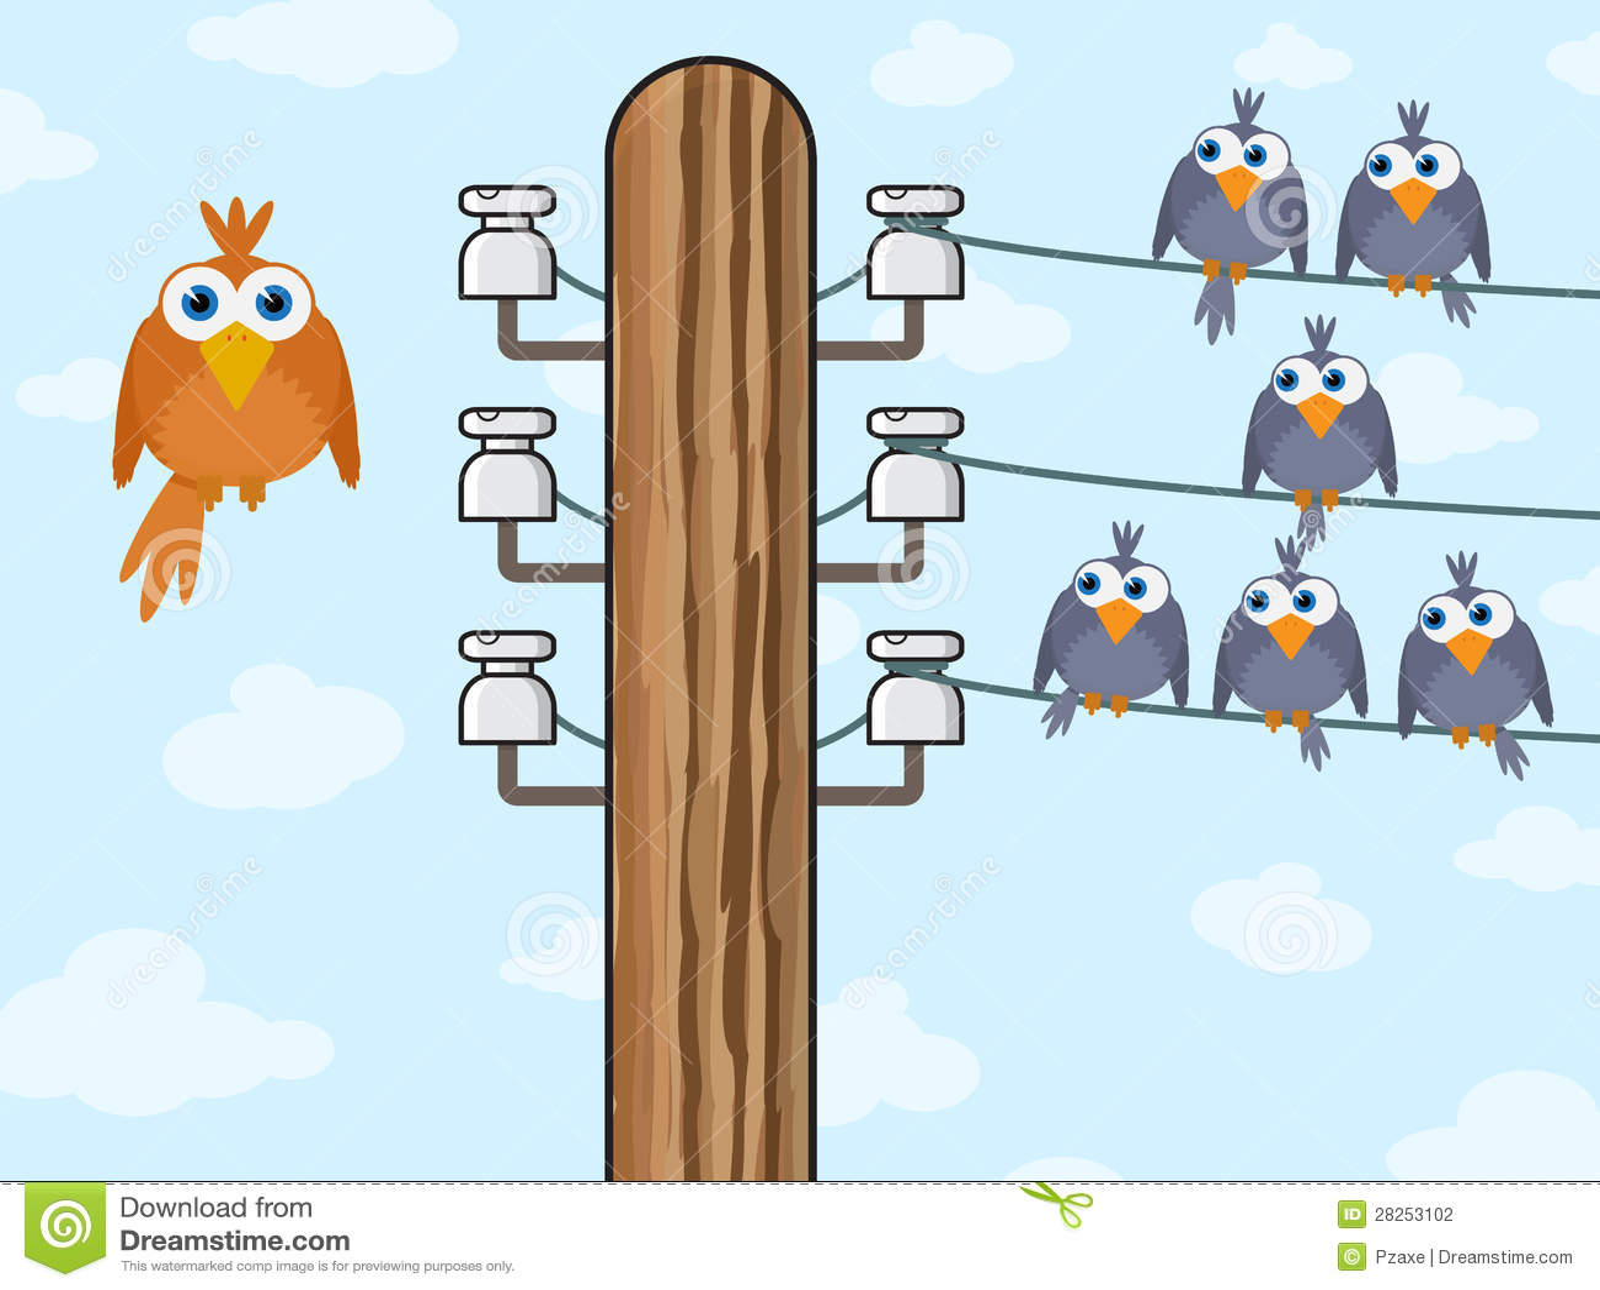 Sitting Birds Symbolize Wireless Technology Stock